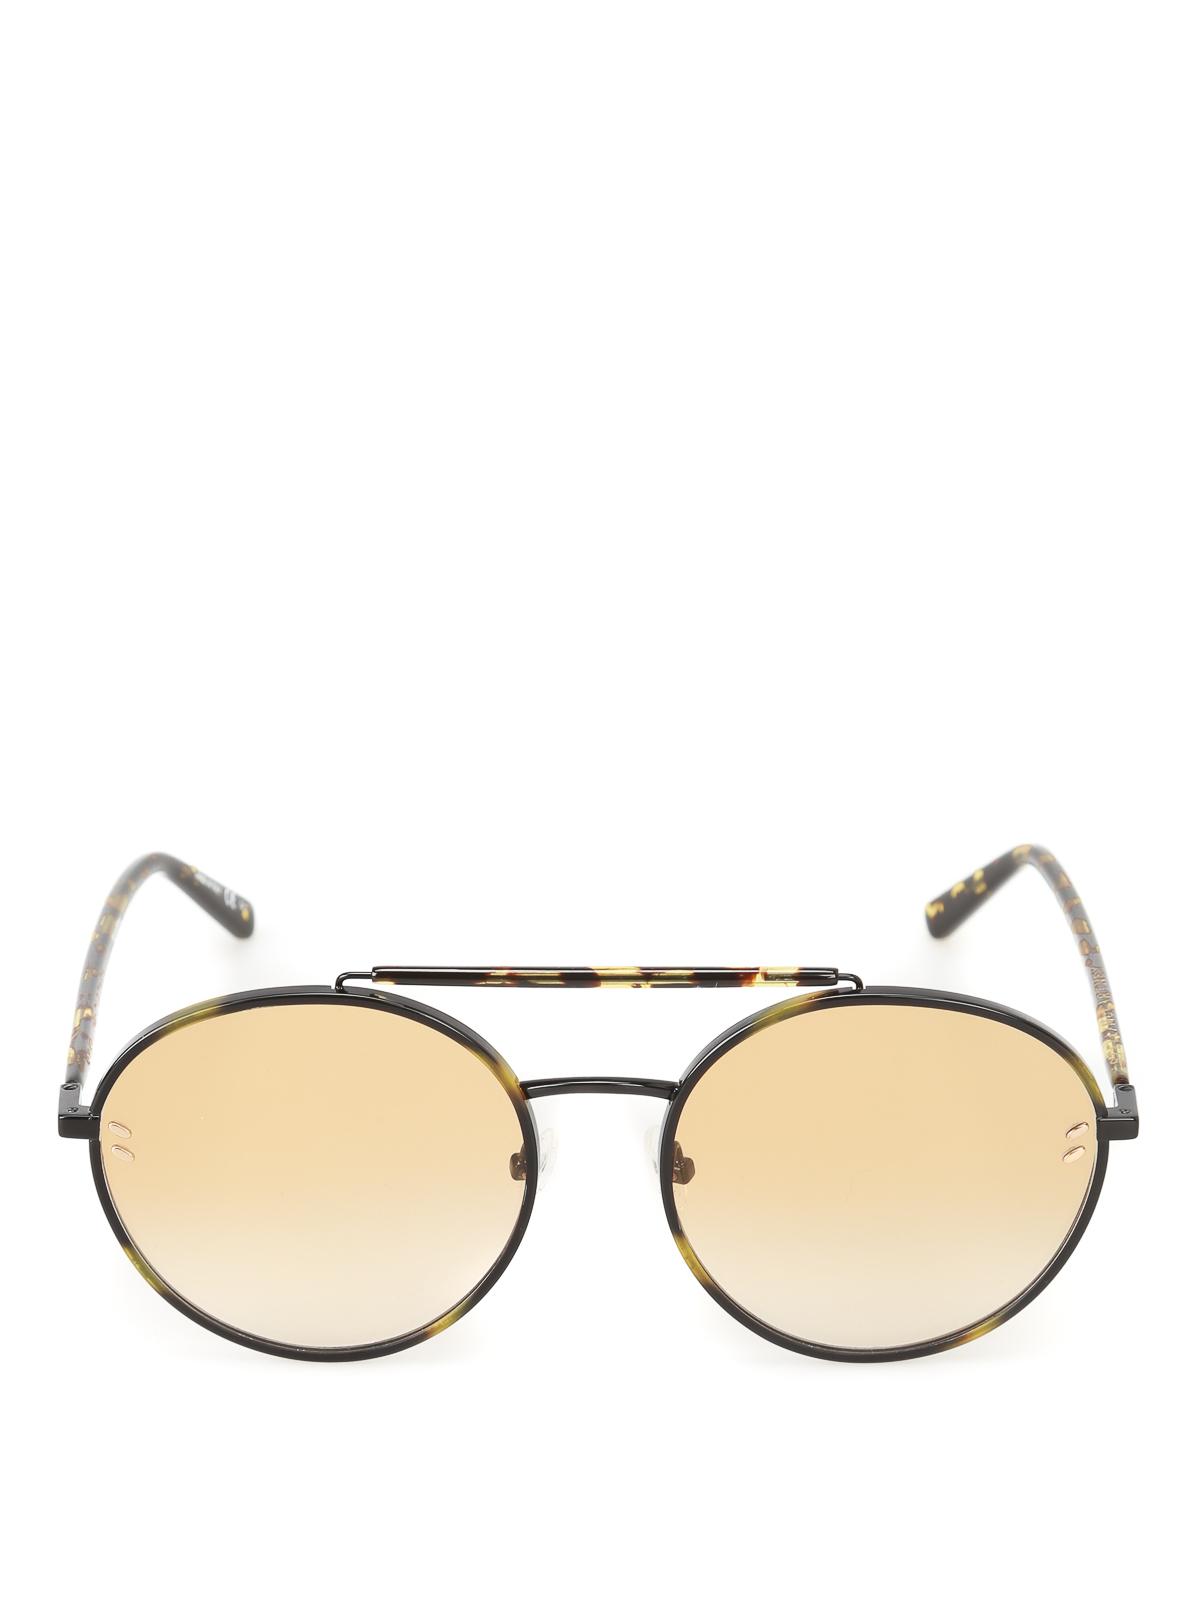 c0adf5a06a5c5 Stella Mccartney - Havana round sunglasses - sunglasses - SC0134S002